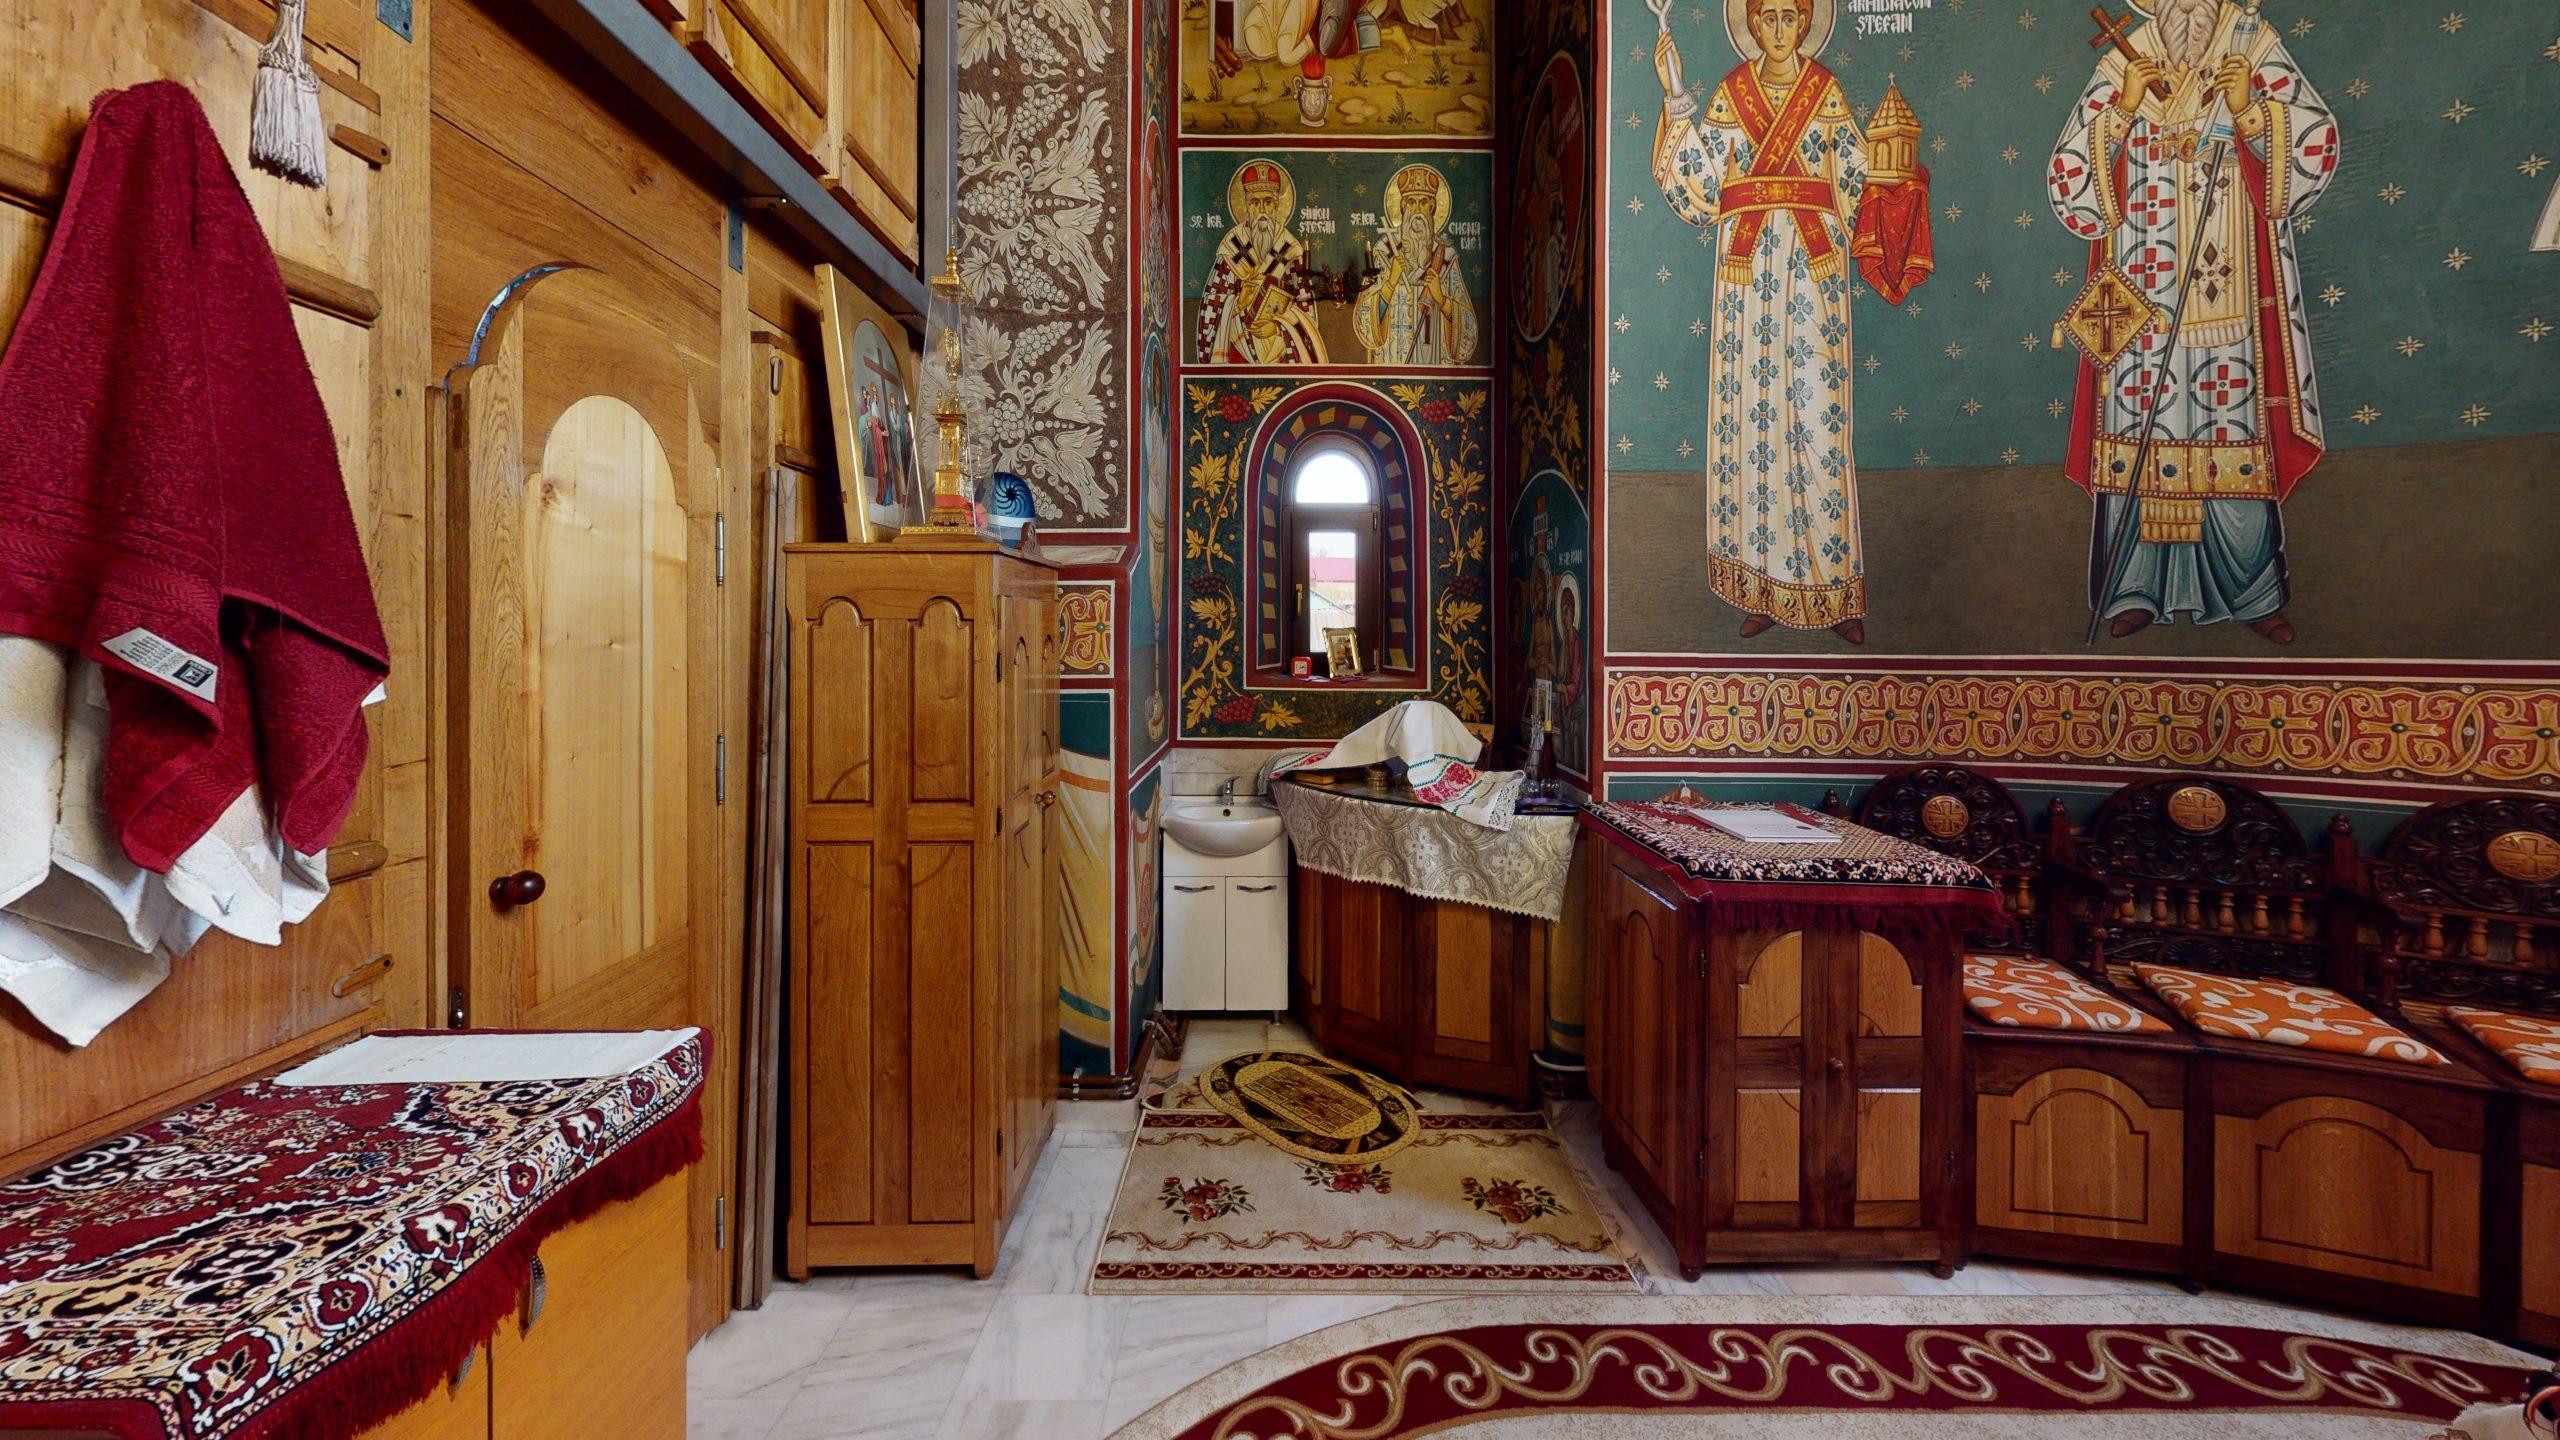 Biserica-Sfintii-Trei-Ierarhi-Flamanzi-Bedroom(2)